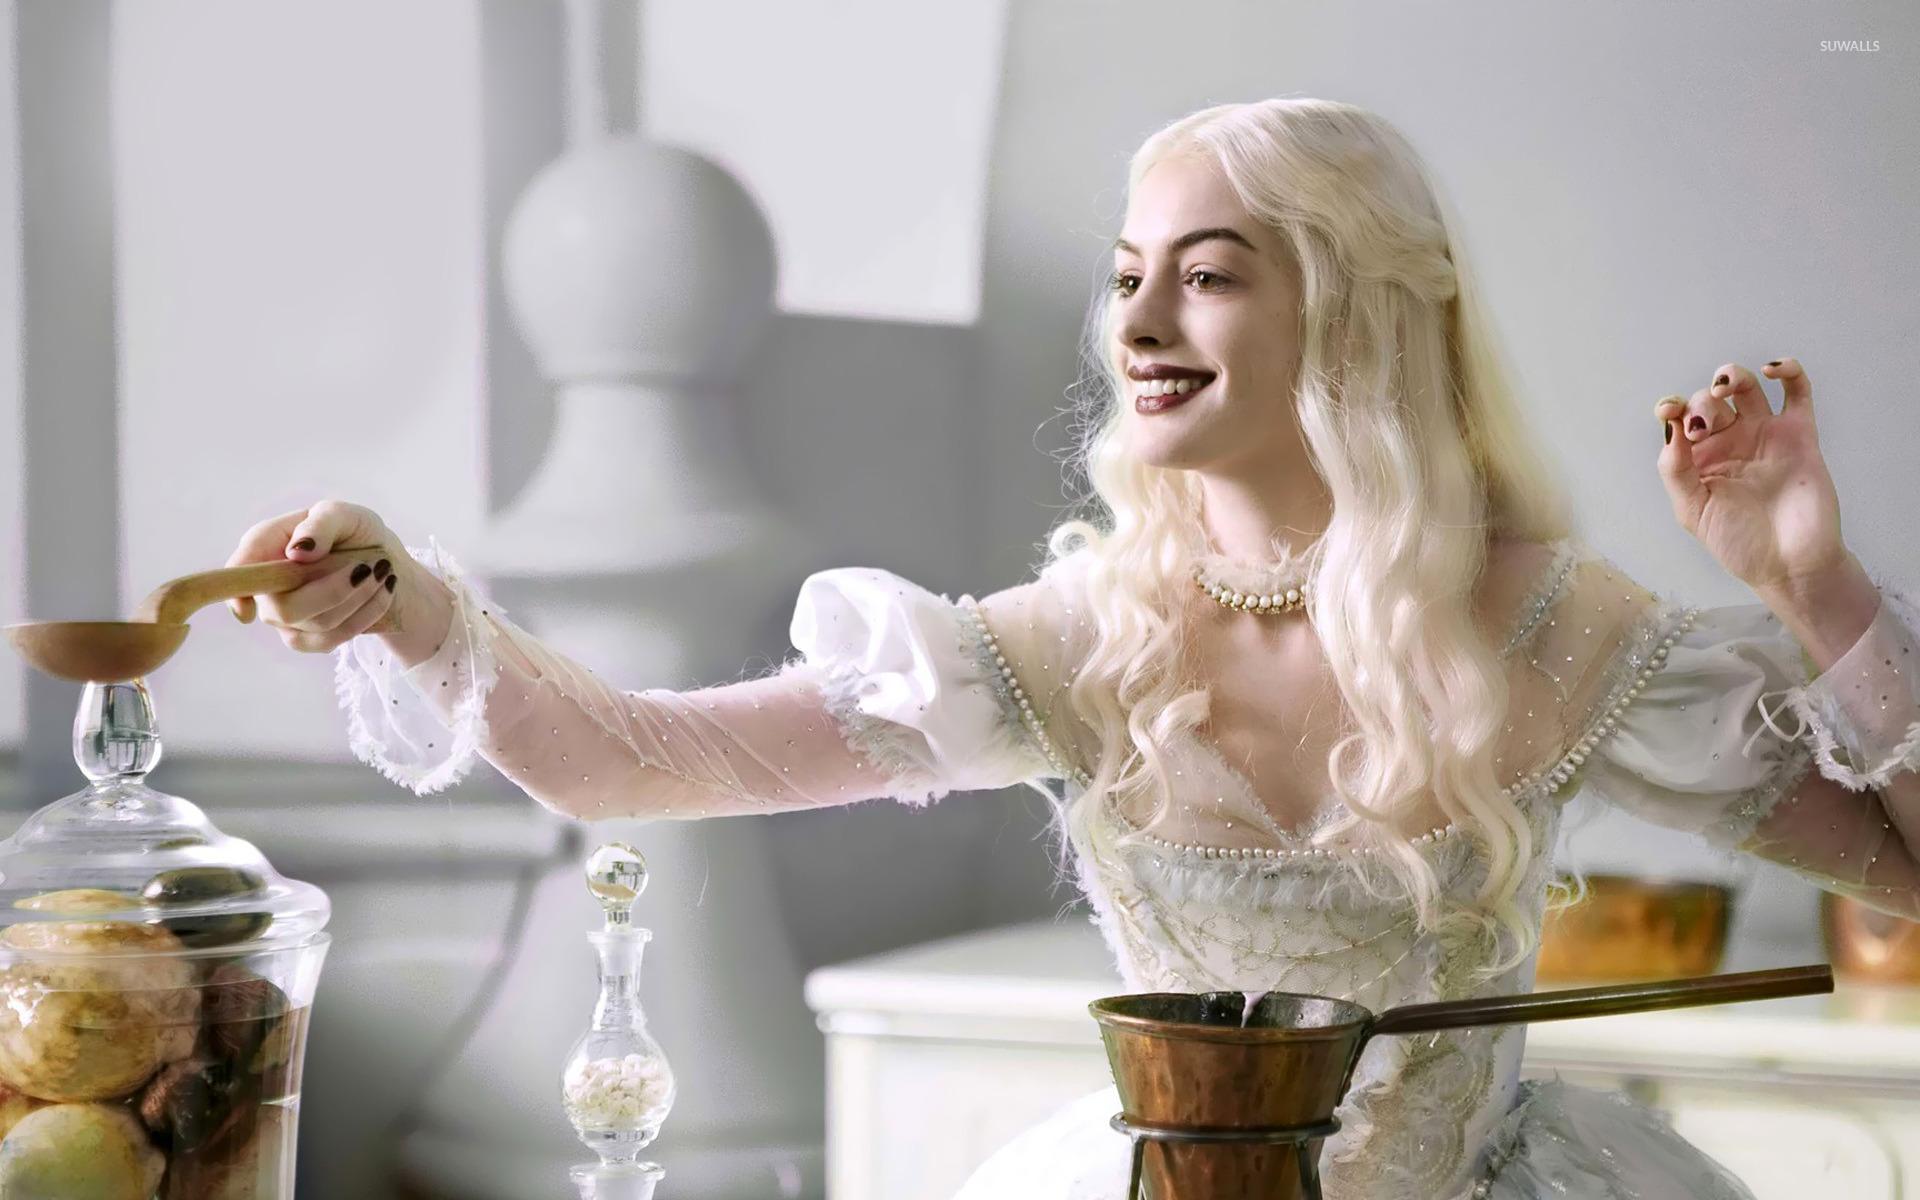 White Queen Alice In Wonderland Wallpaper Movie Wallpapers